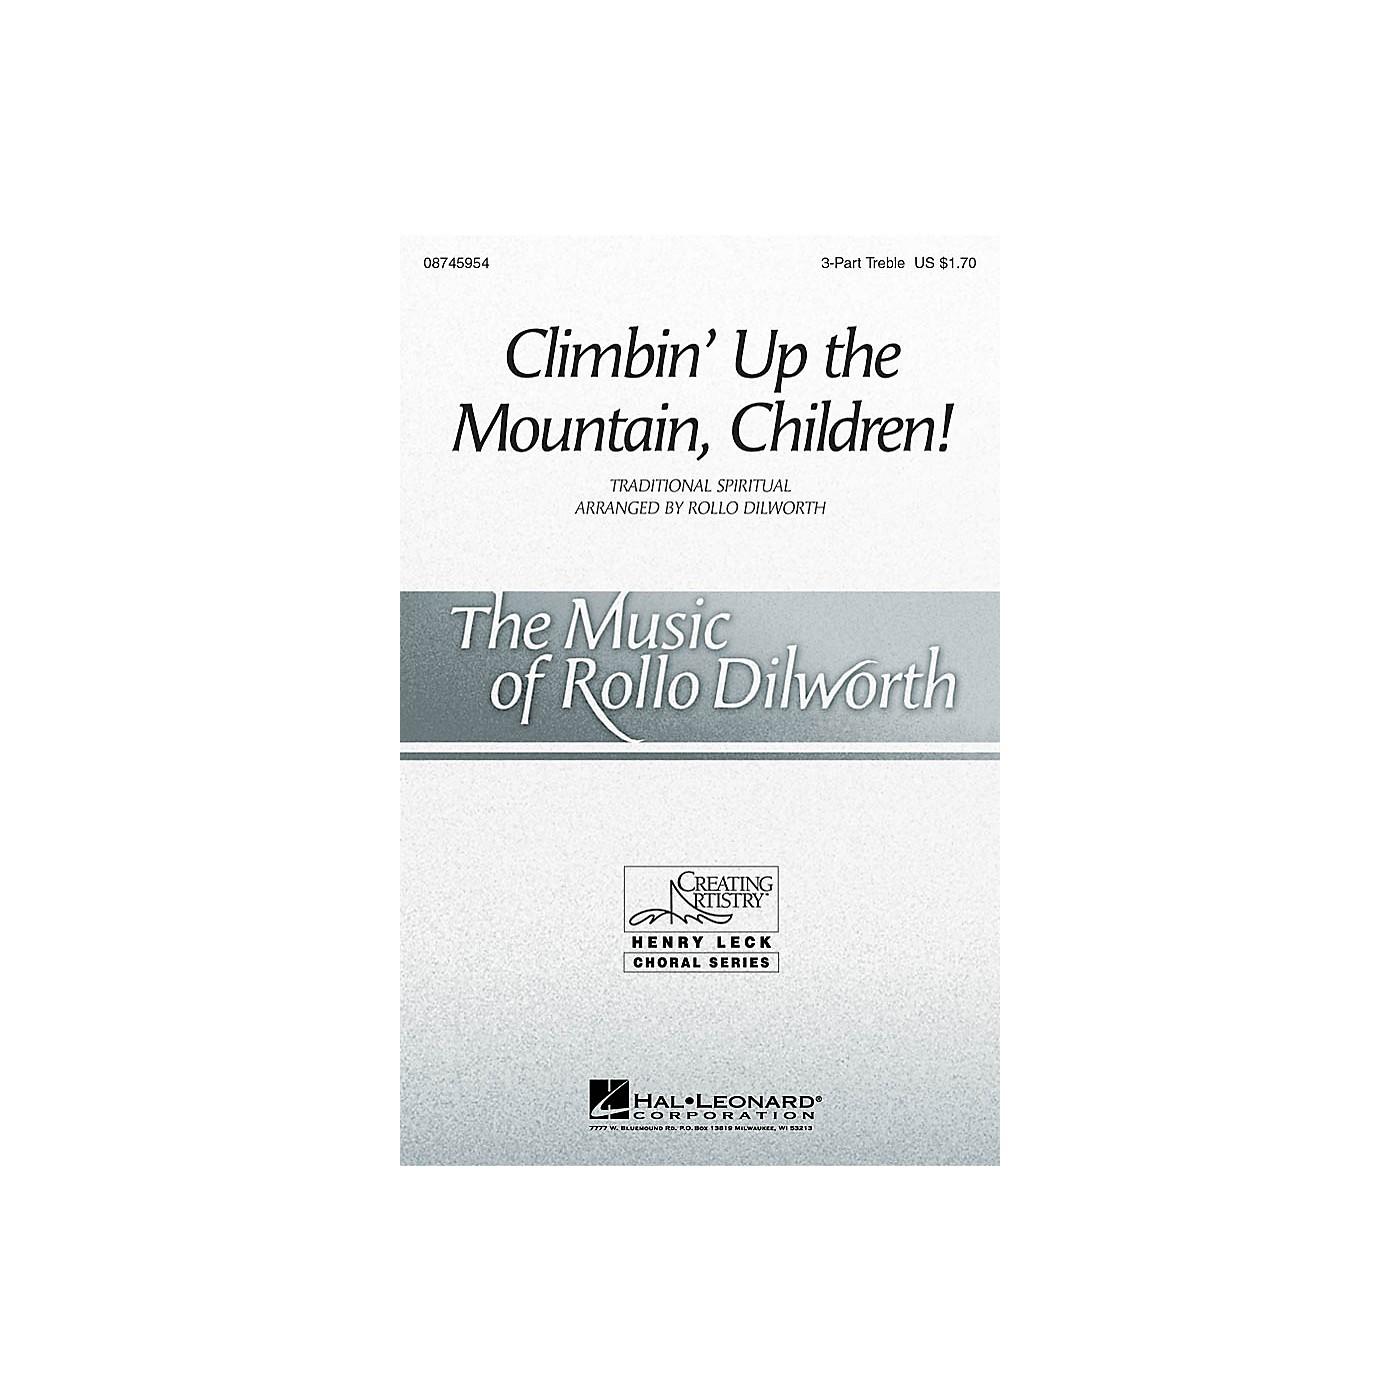 Hal Leonard Climbin' Up the Mountain, Children! 3 Part Treble arranged by Rollo Dilworth thumbnail